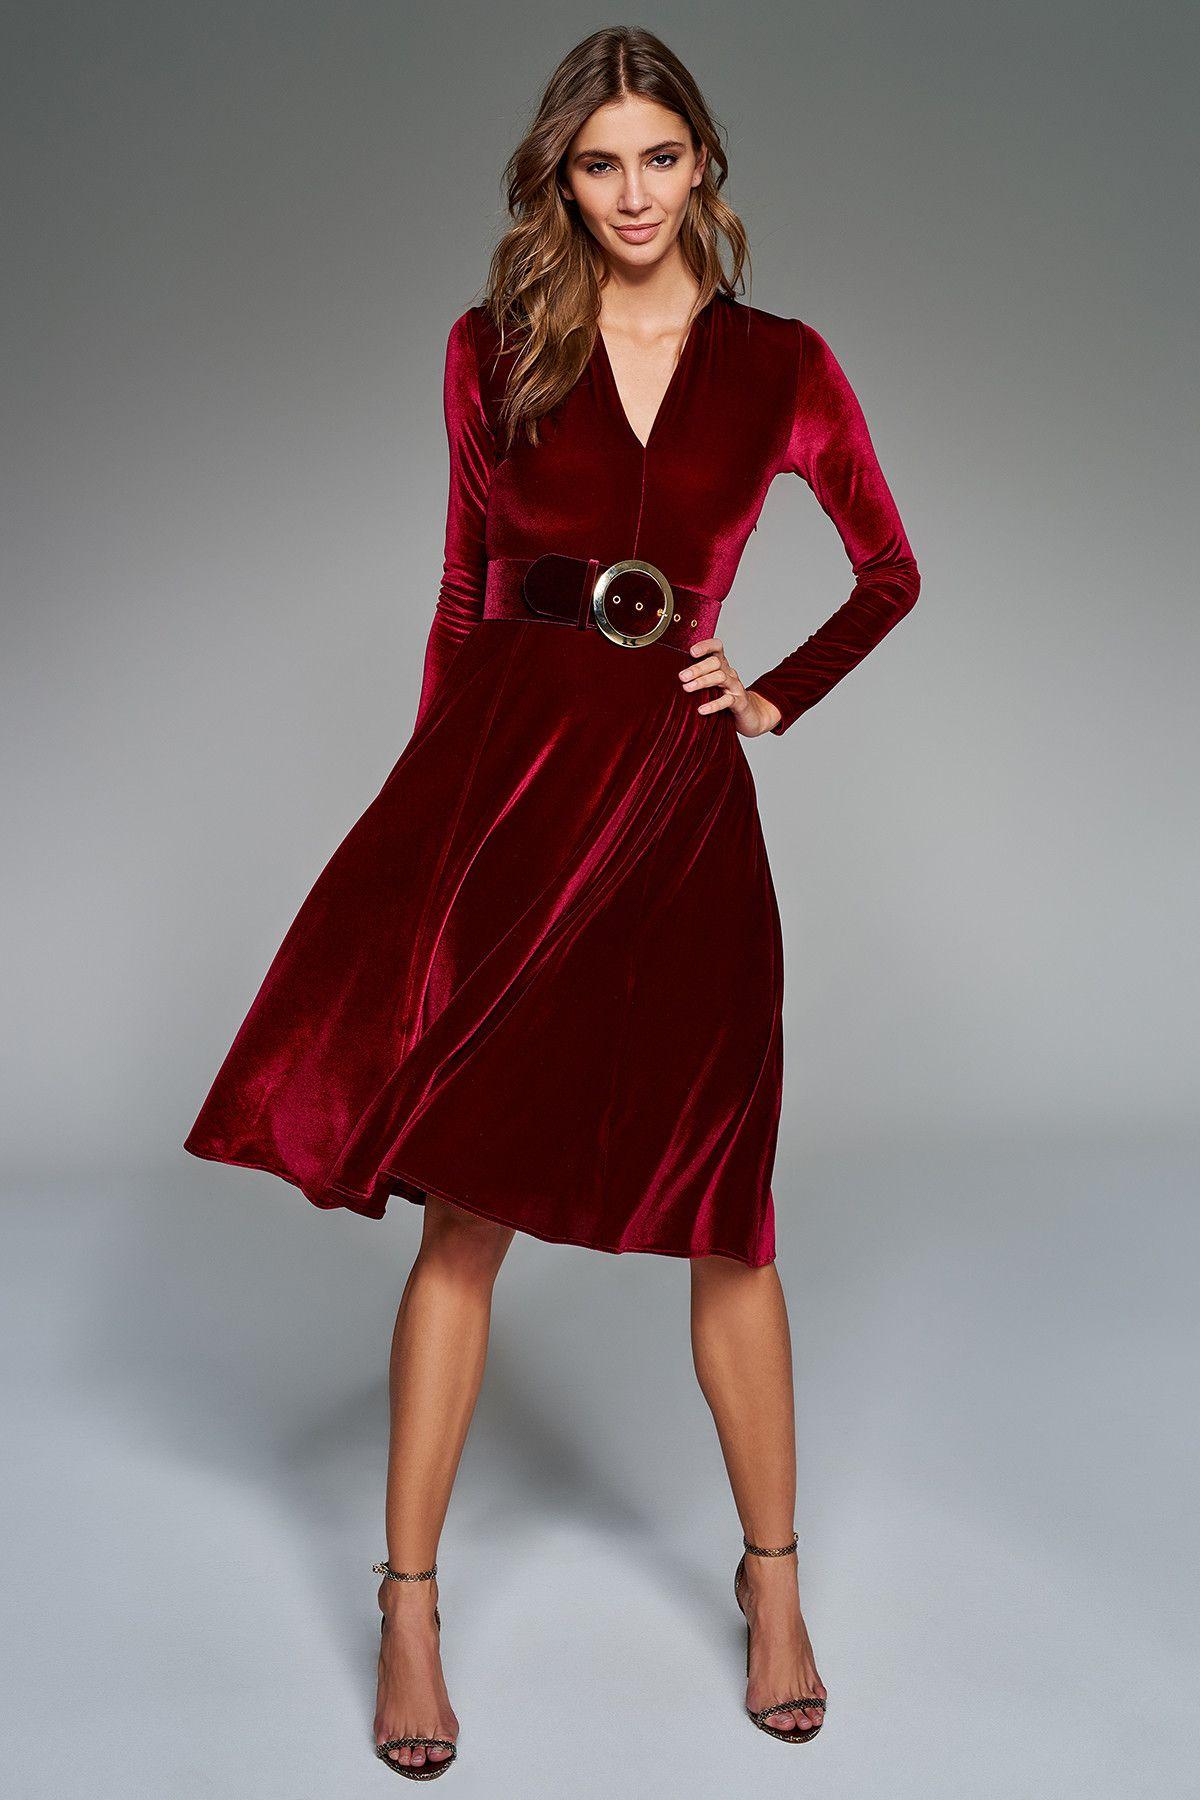 Trendyolmilla Trendyolmilla Bordo Kadife Elbise Elbise Elbise Modelleri Kiyafet